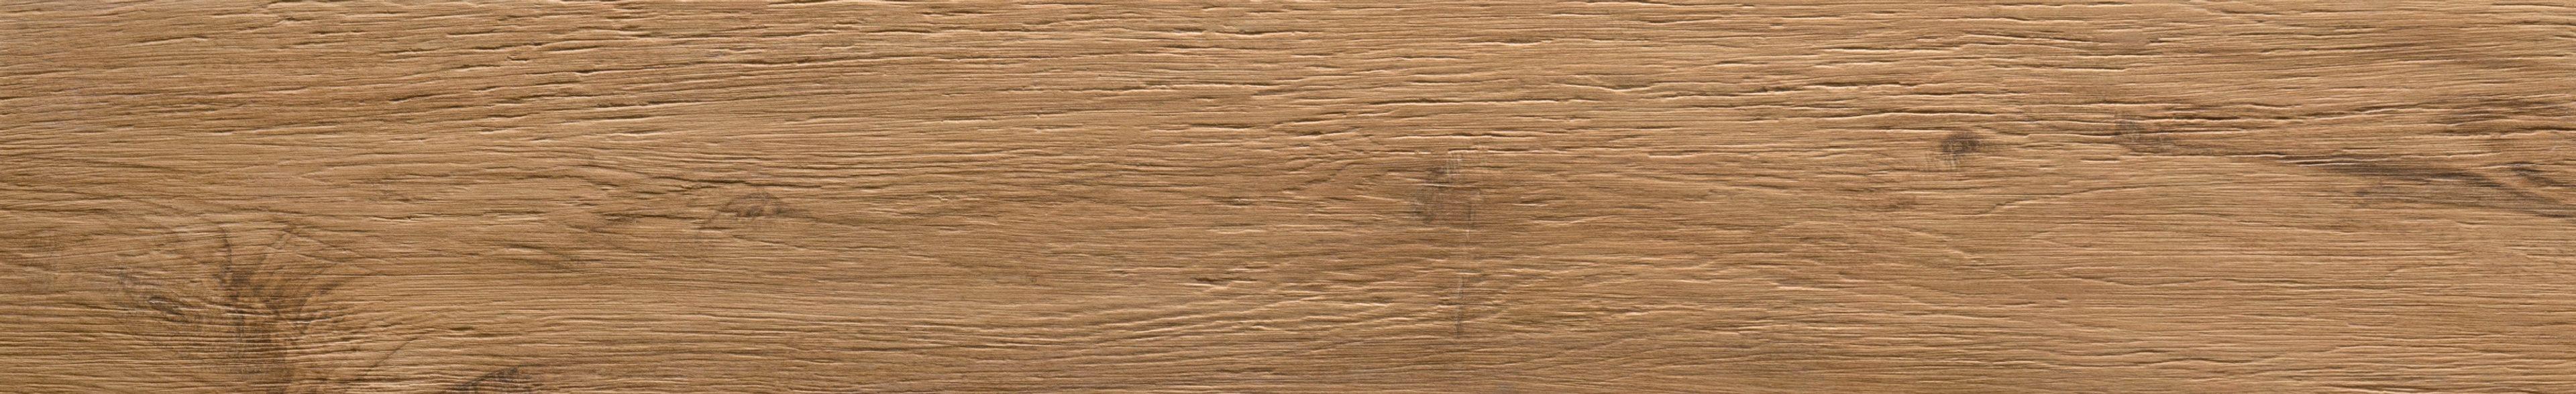 rev tement de sol mur cologique non g lif effet bois evoke beige by ceramiche keope. Black Bedroom Furniture Sets. Home Design Ideas